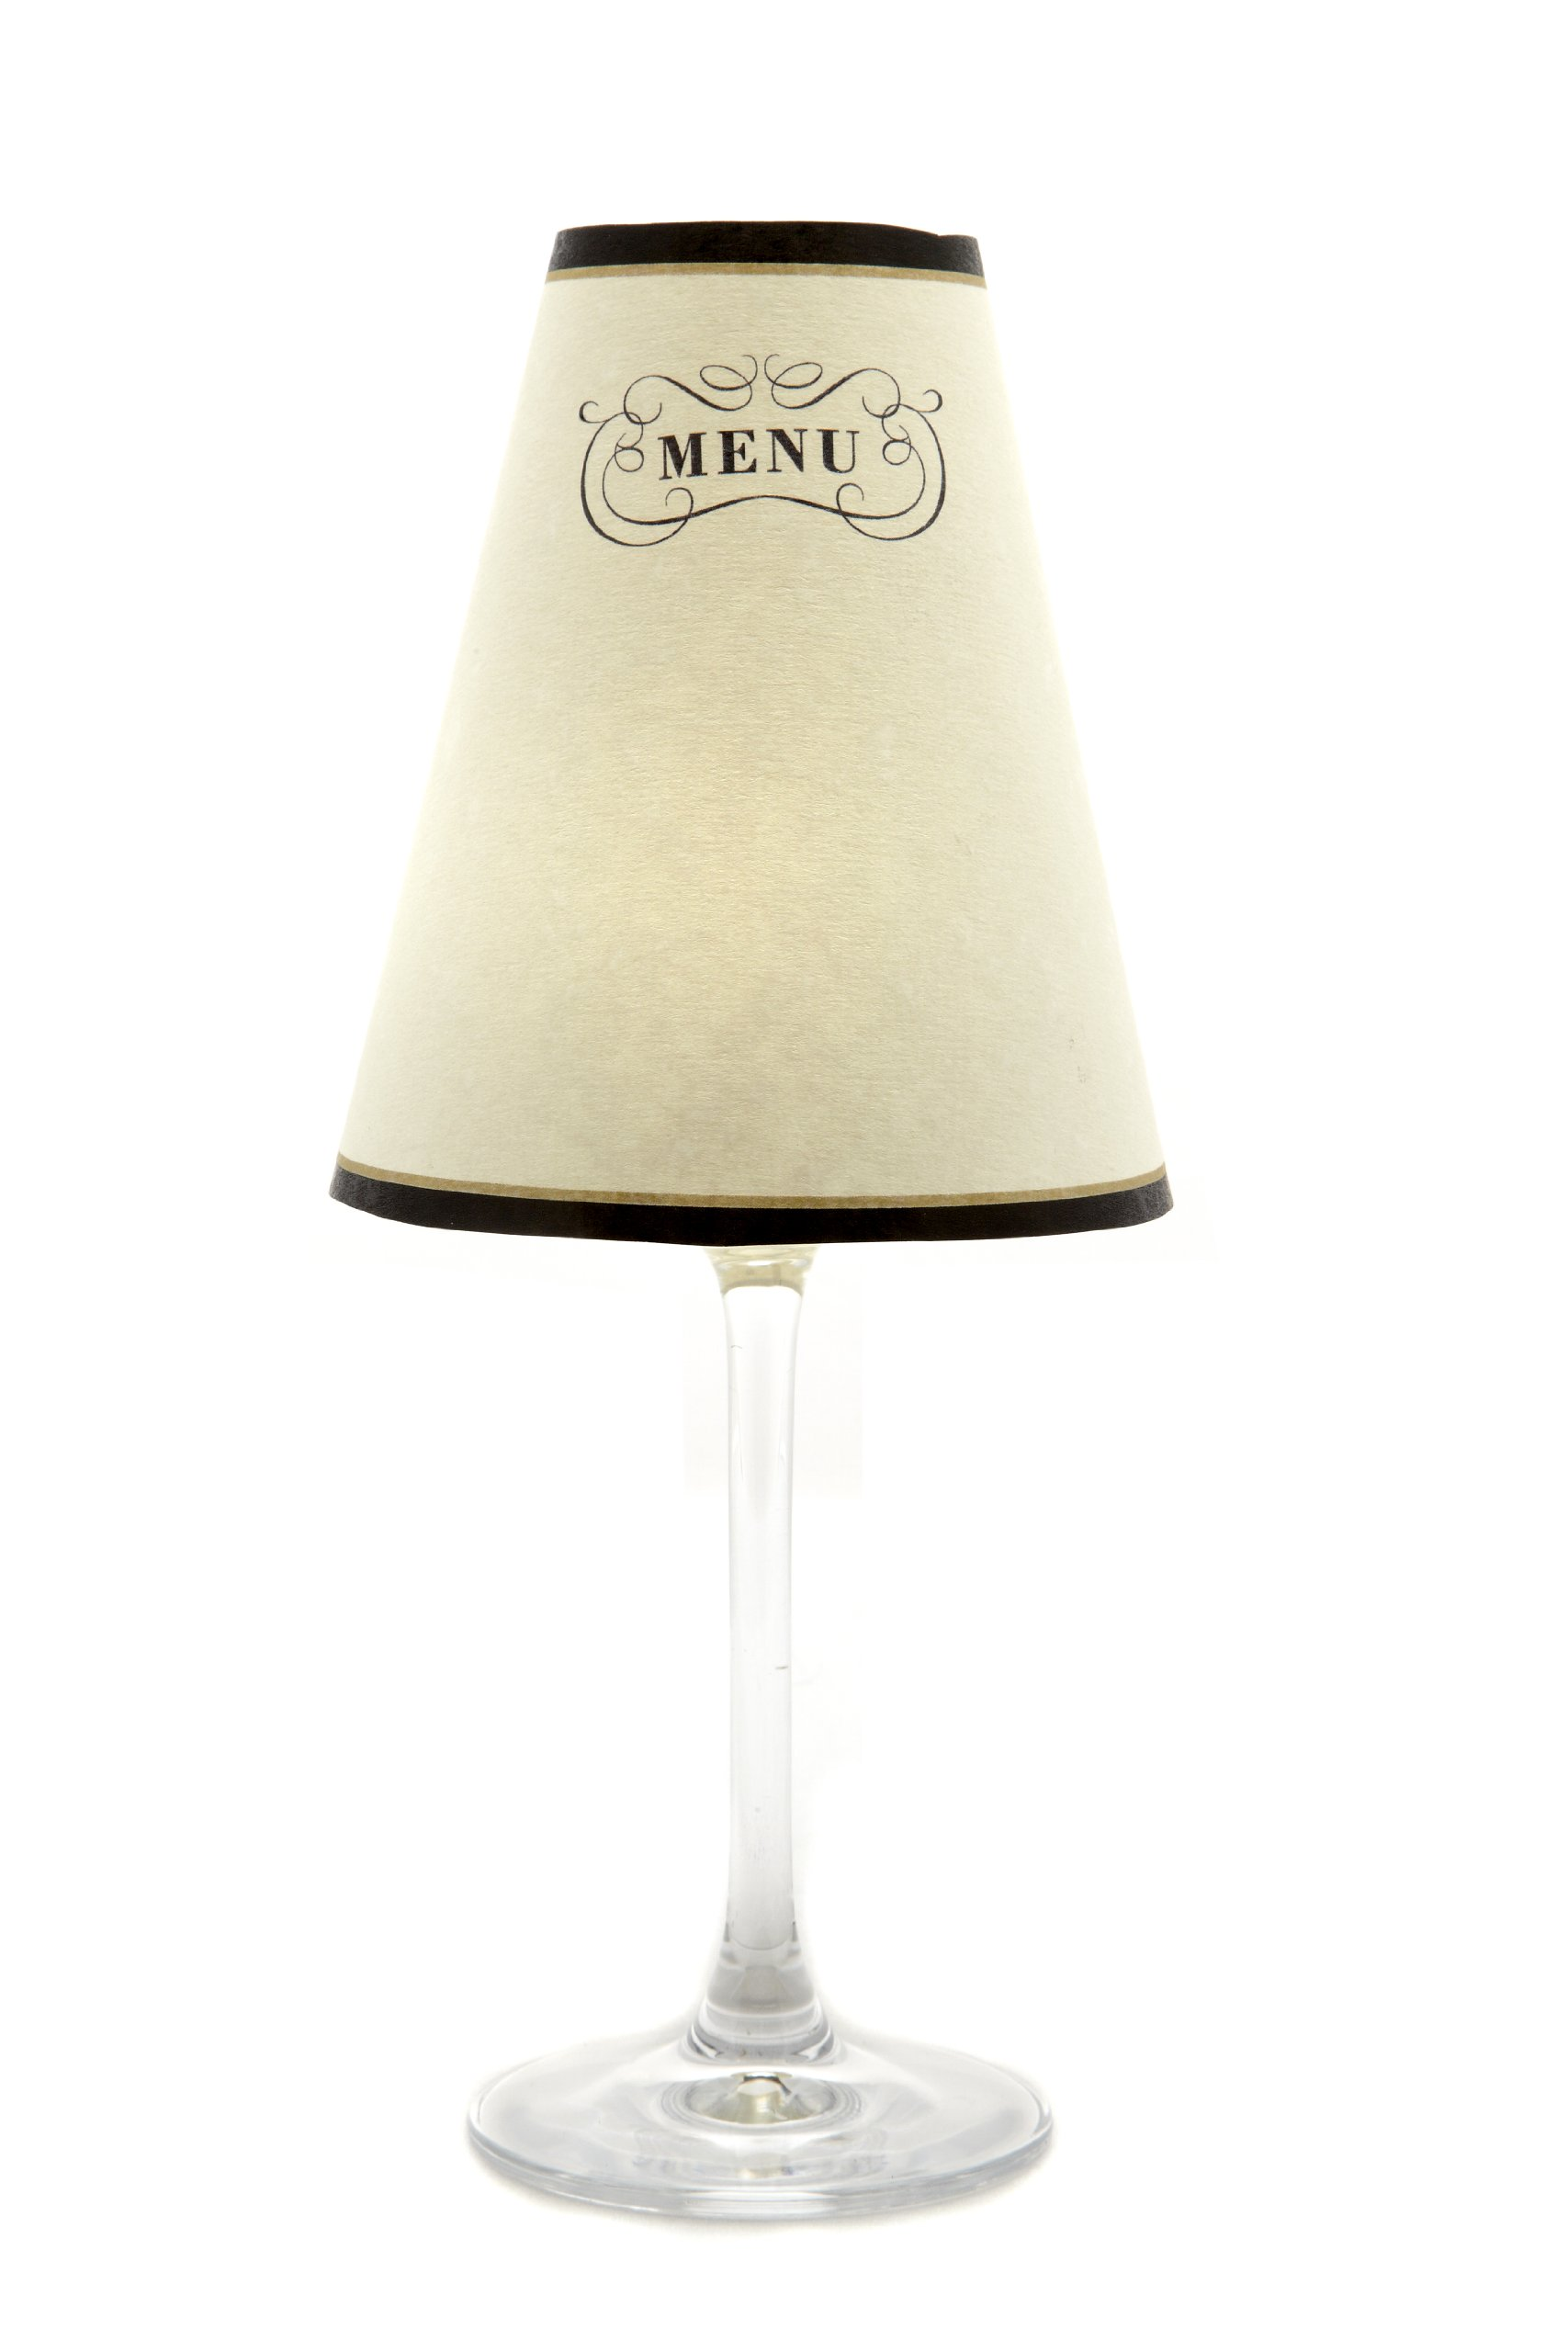 di Potter WS109 Paris Menu Paper White Wine Glass Shade, Parchment (Pack of 6)